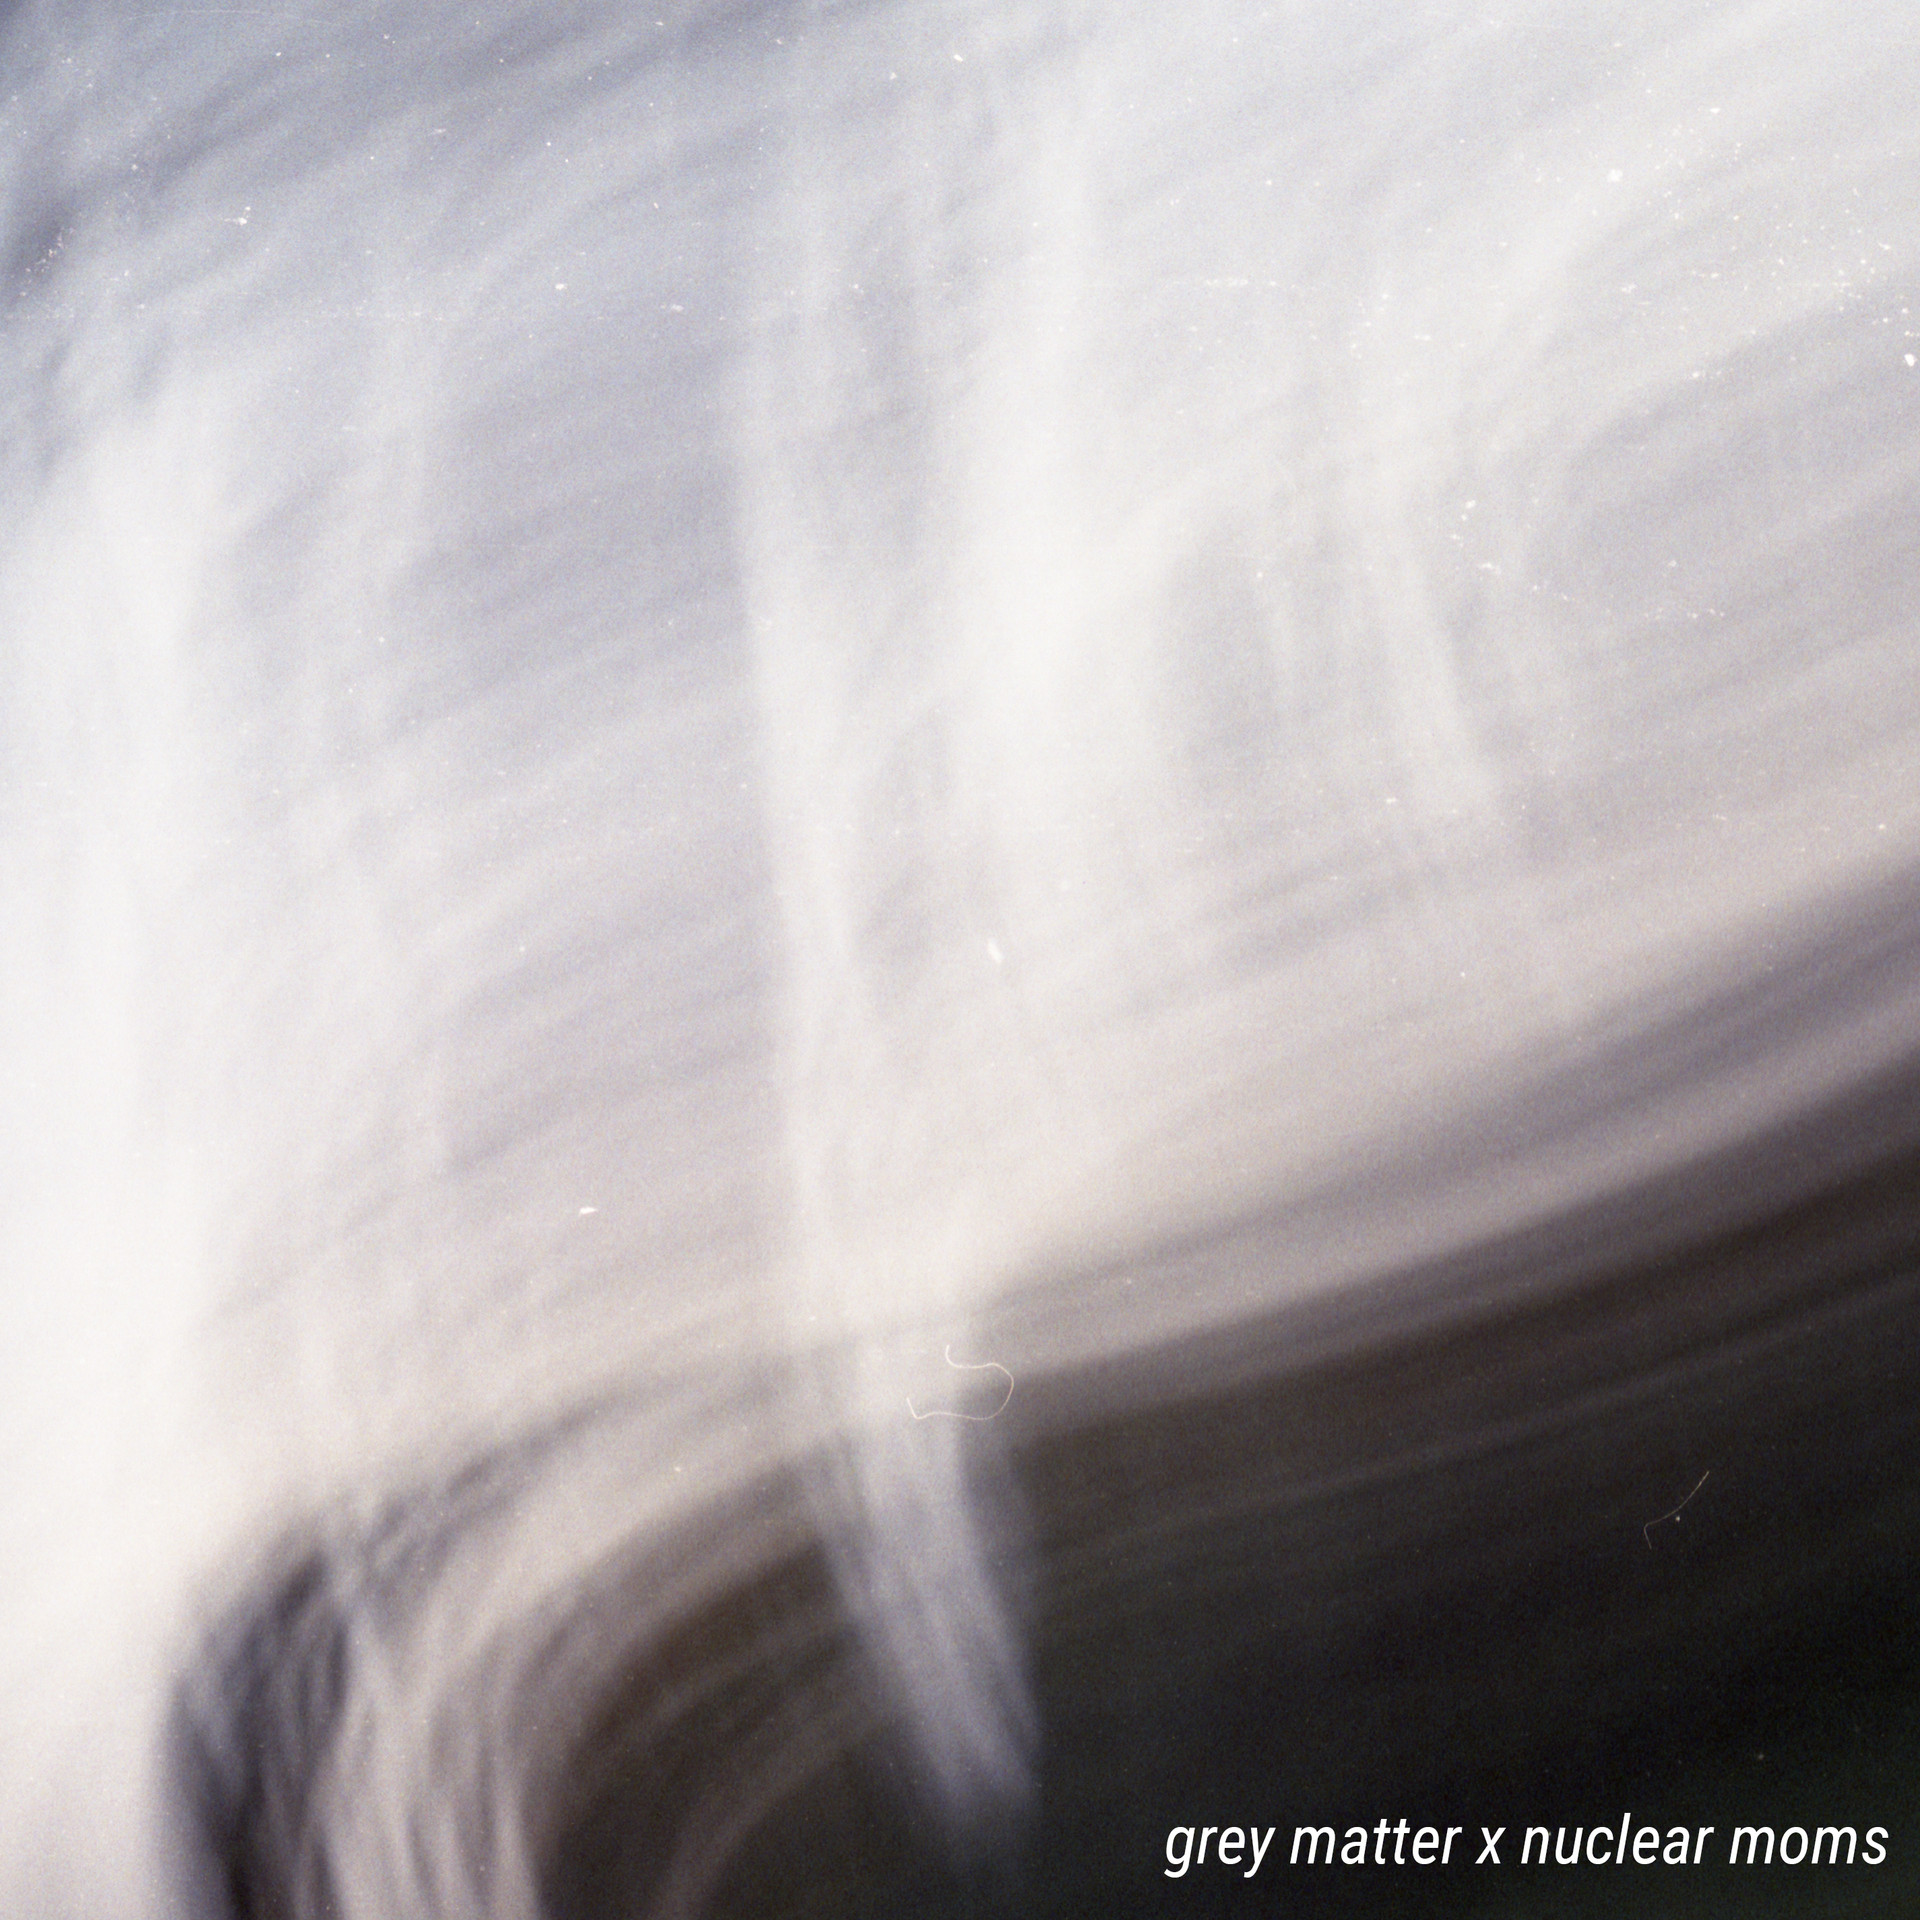 Grey Matter x Nuclears Moms split